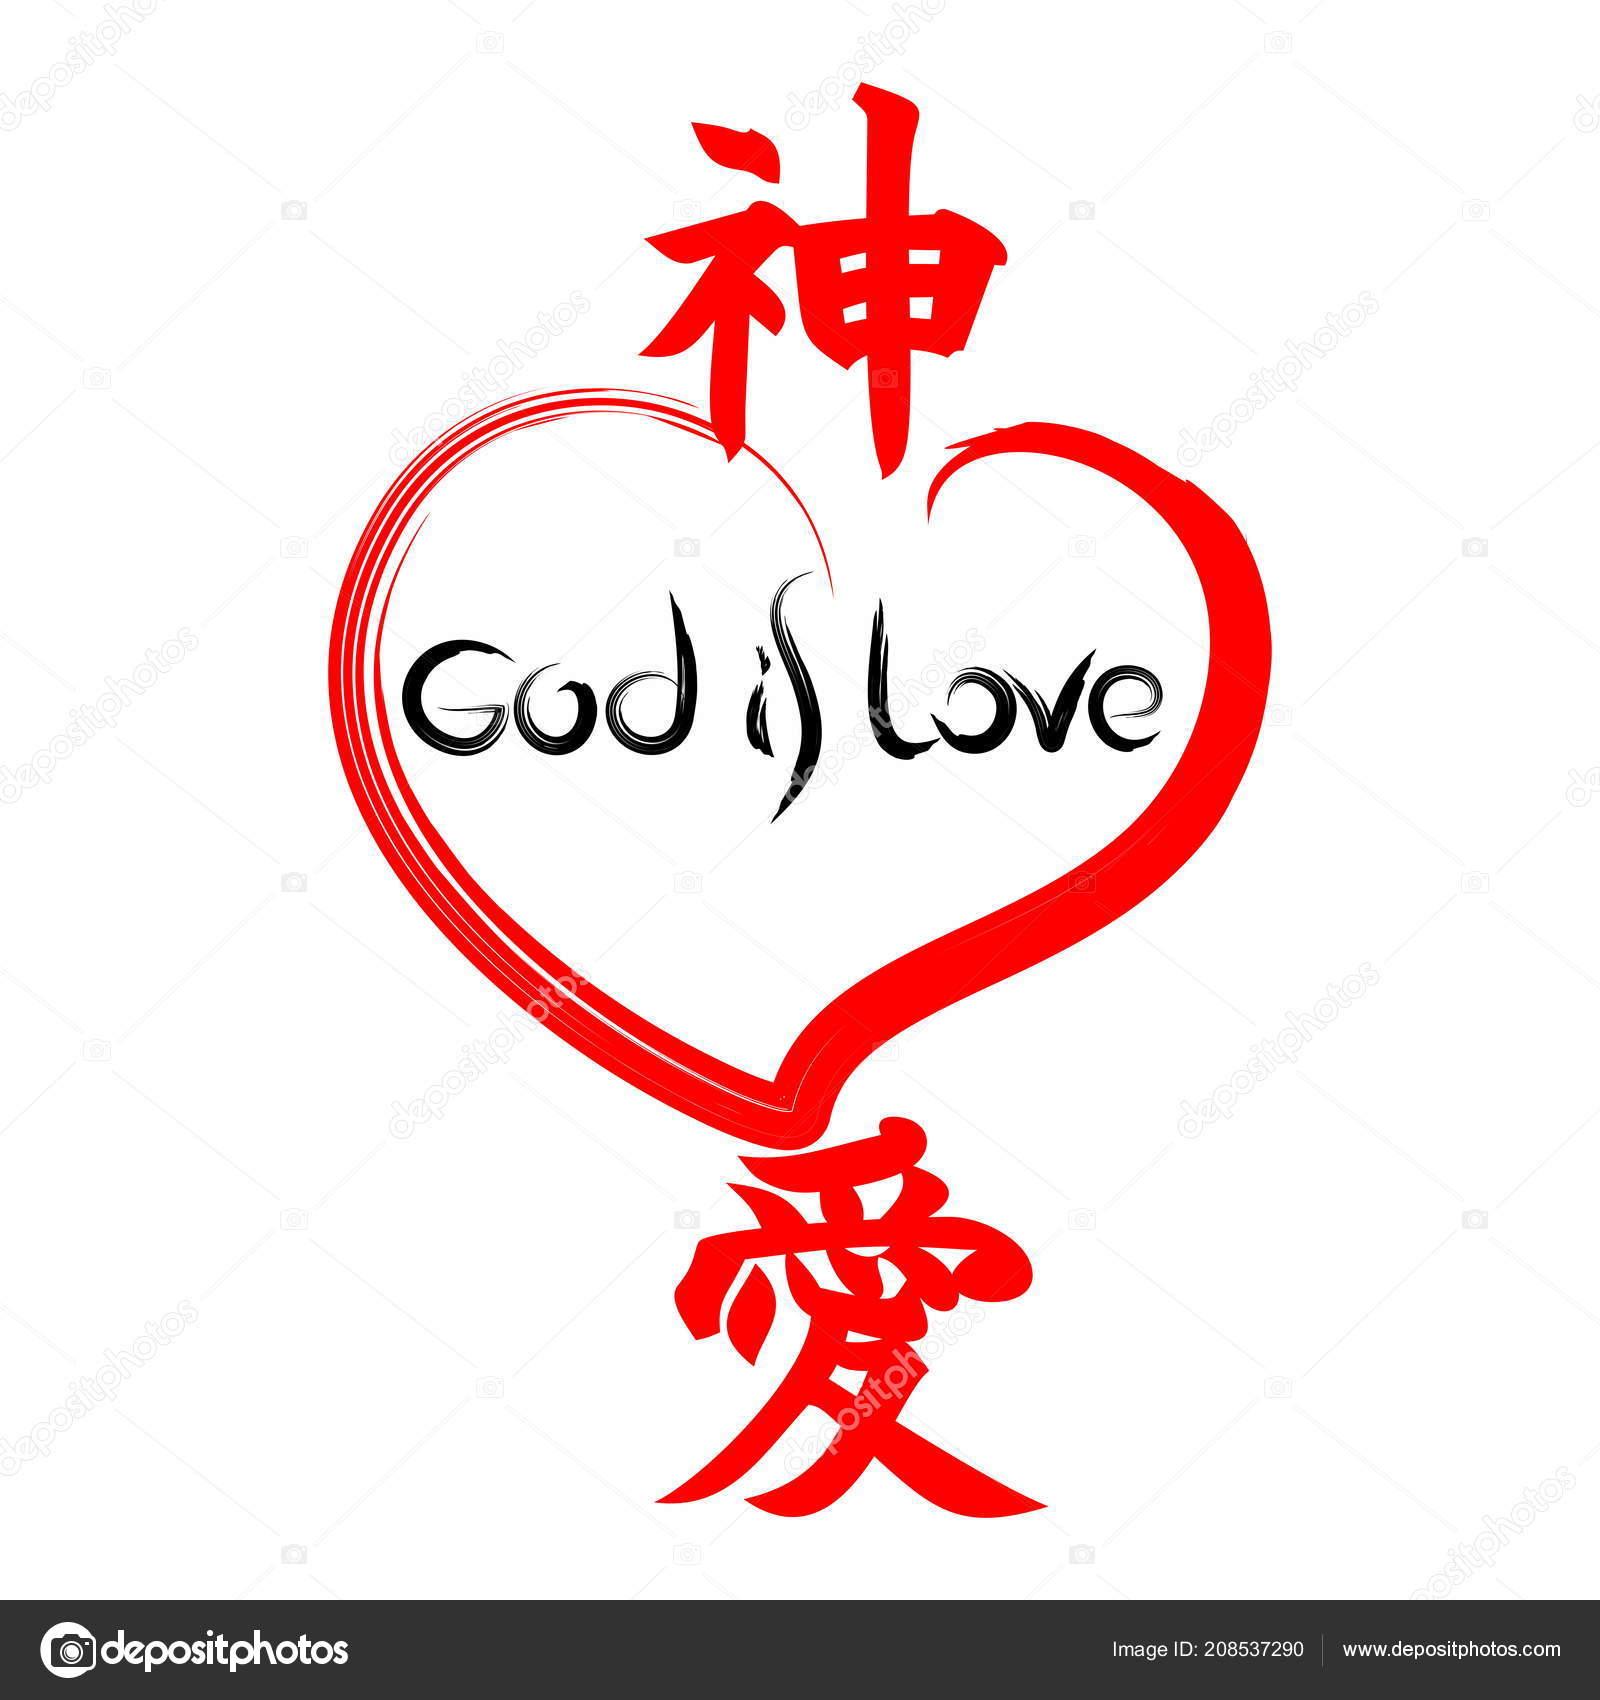 Dios Amor Evangelio Kanji Japones Archivo Imagenes Vectoriales